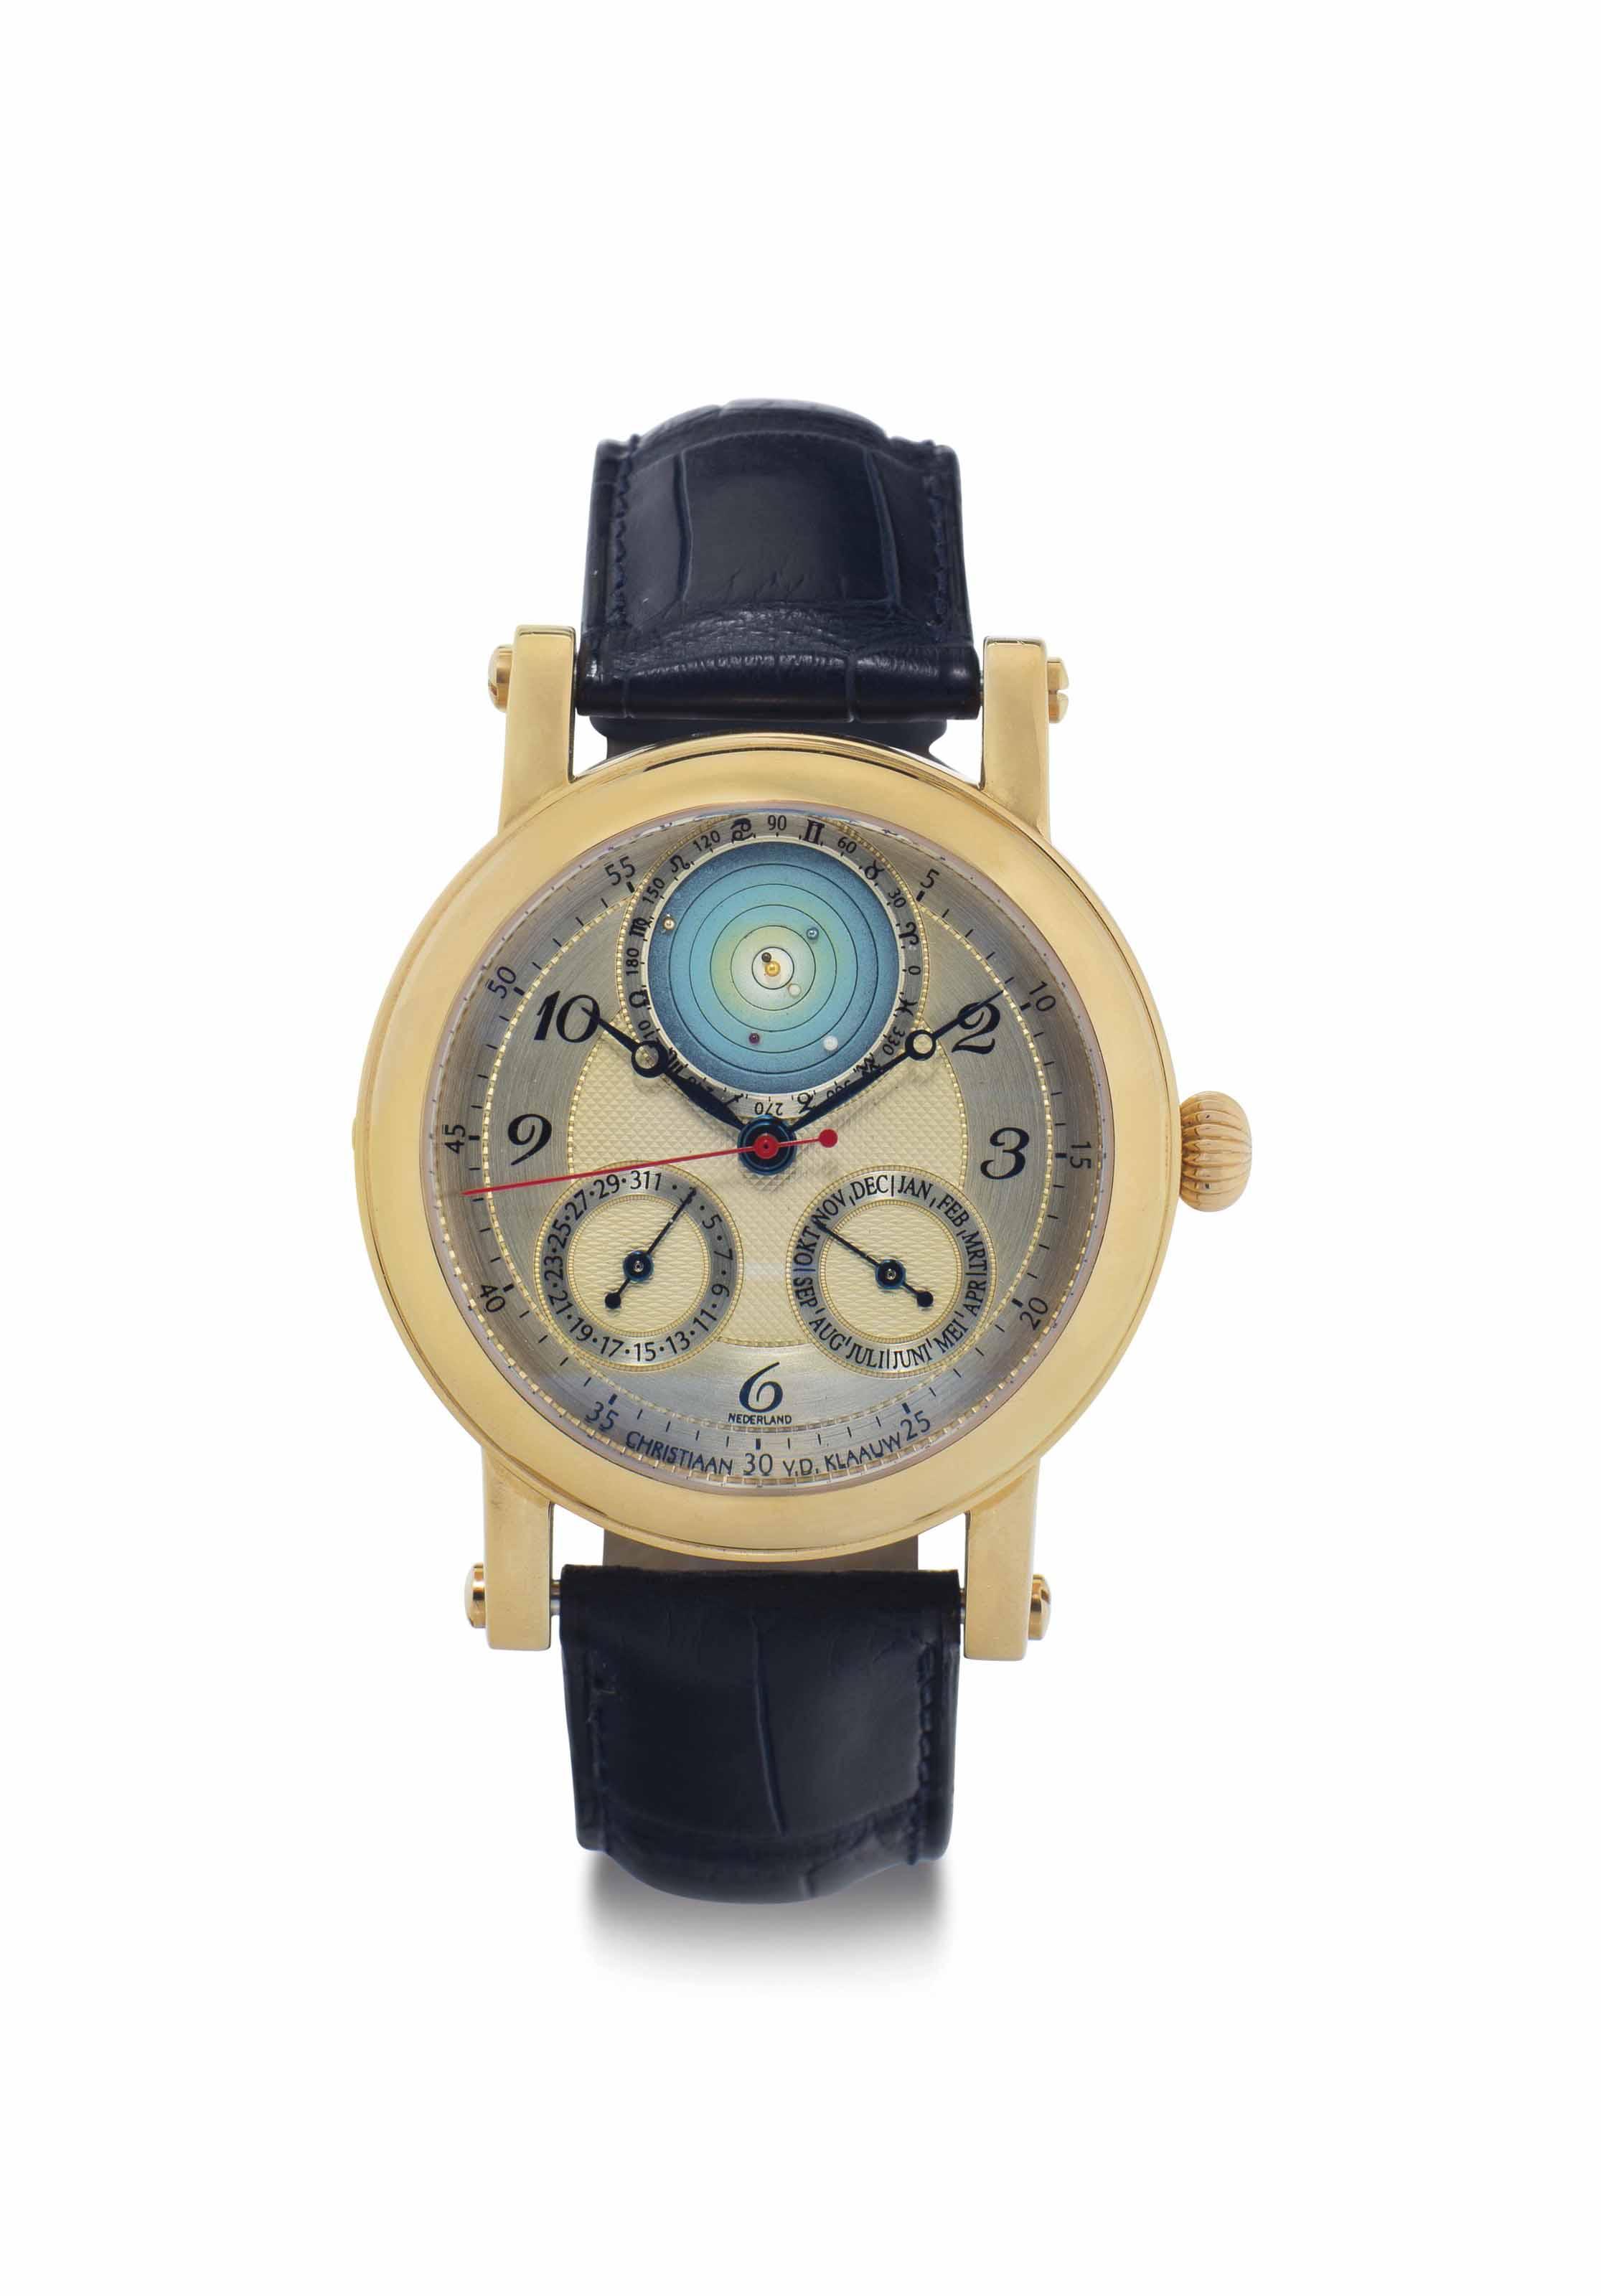 Christiaan Van Der Klaauw. A Fine 18k Pink Gold Automatic Planetarium Calendar Wristwatch